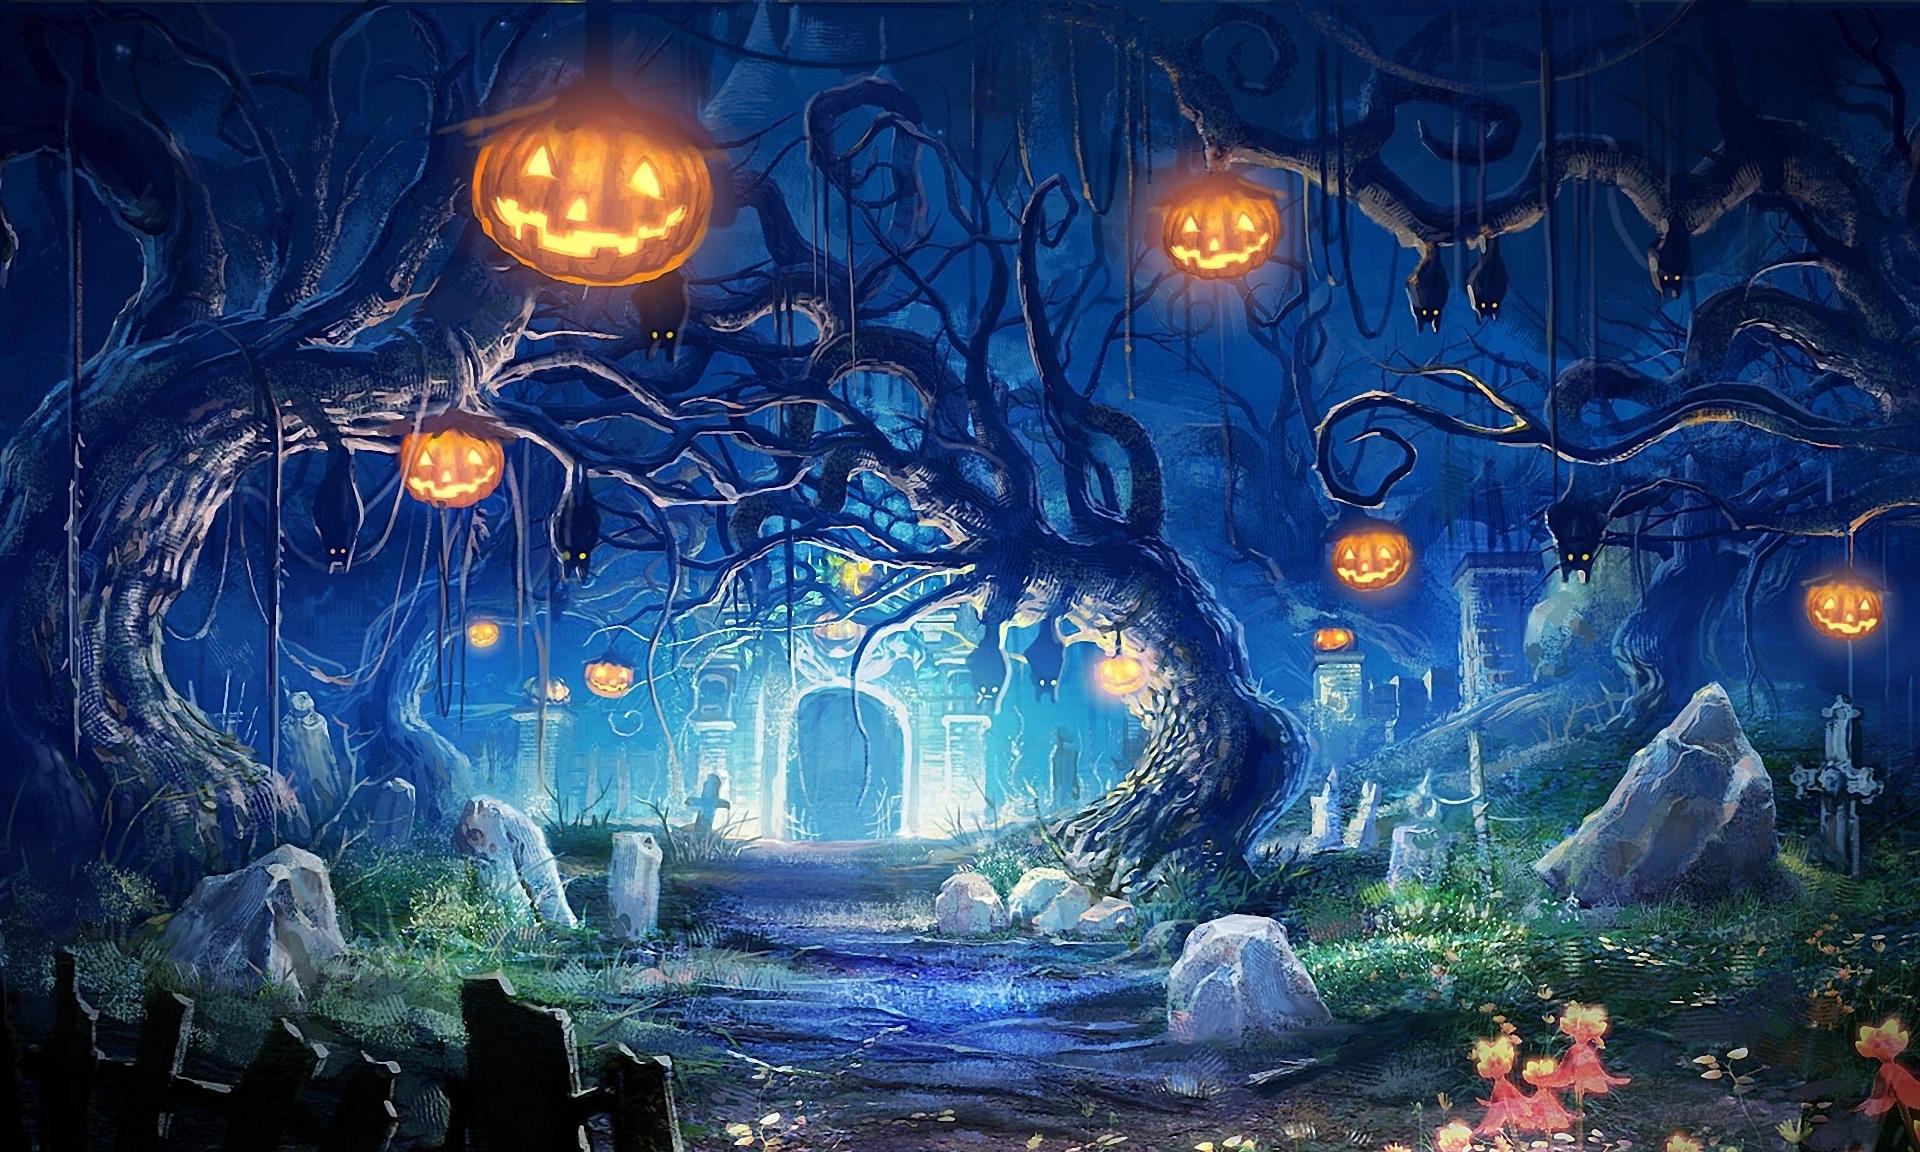 fondos halloween wallpapers gratis -#main